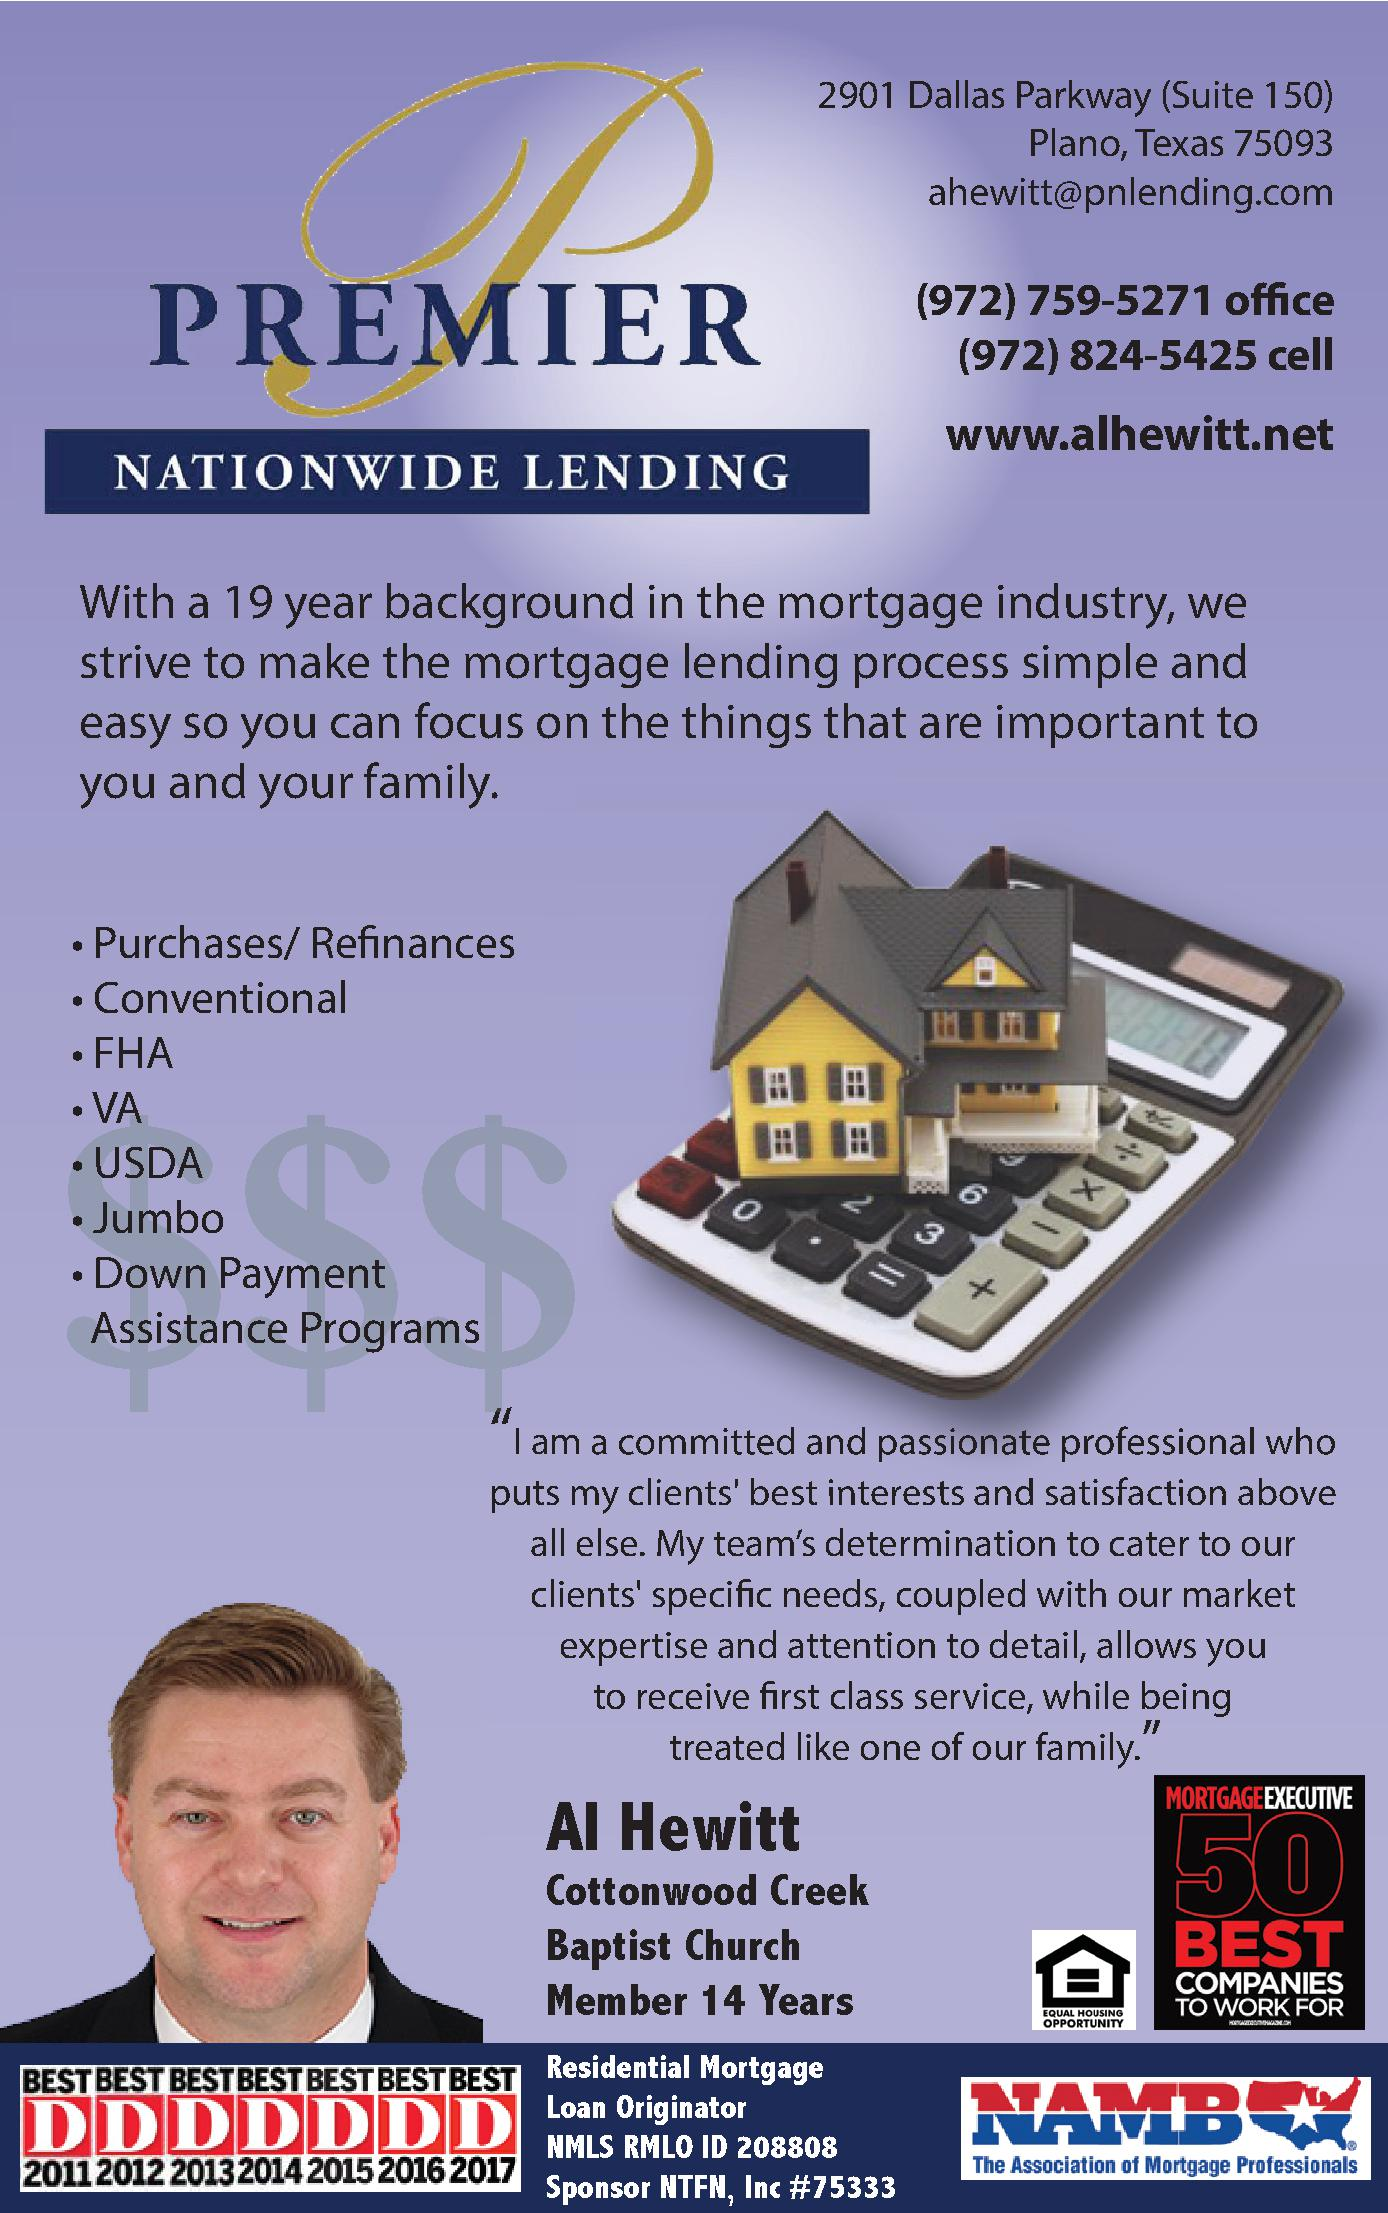 Premier Nationwide Lending